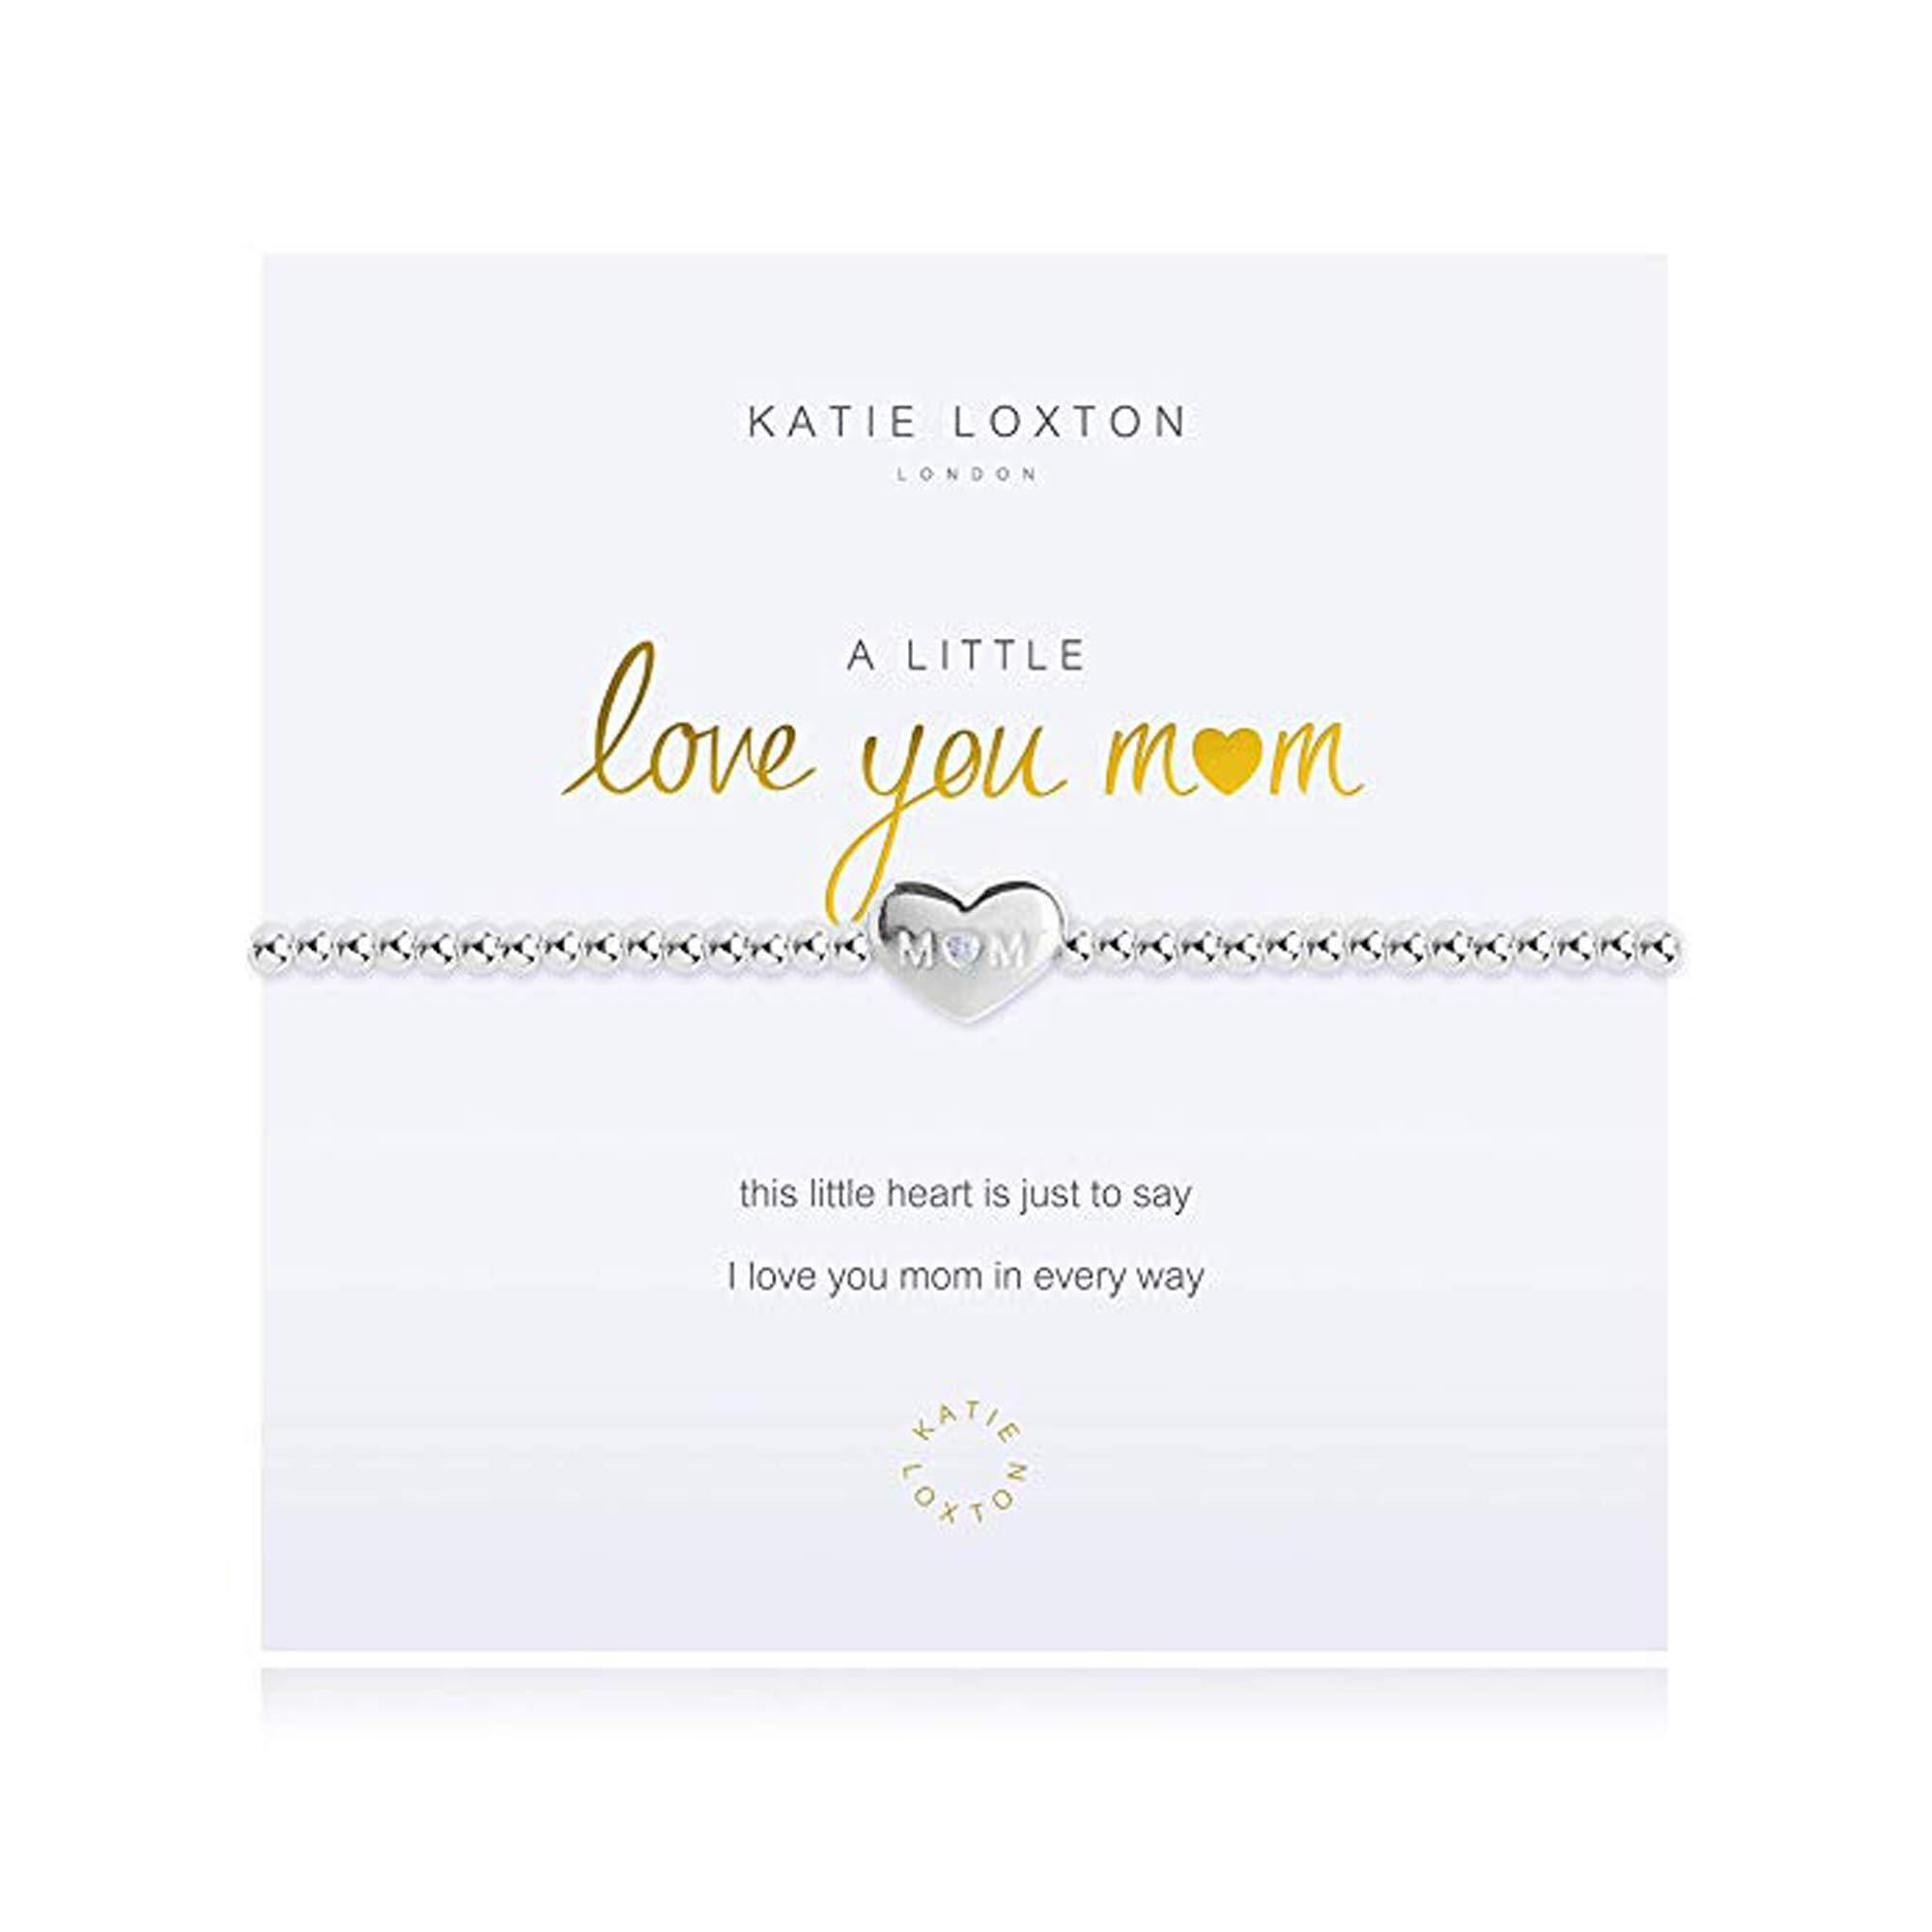 Katie Loxton A Little Love You Mom Silver Women's Stretch Charm Bangle Bracelet